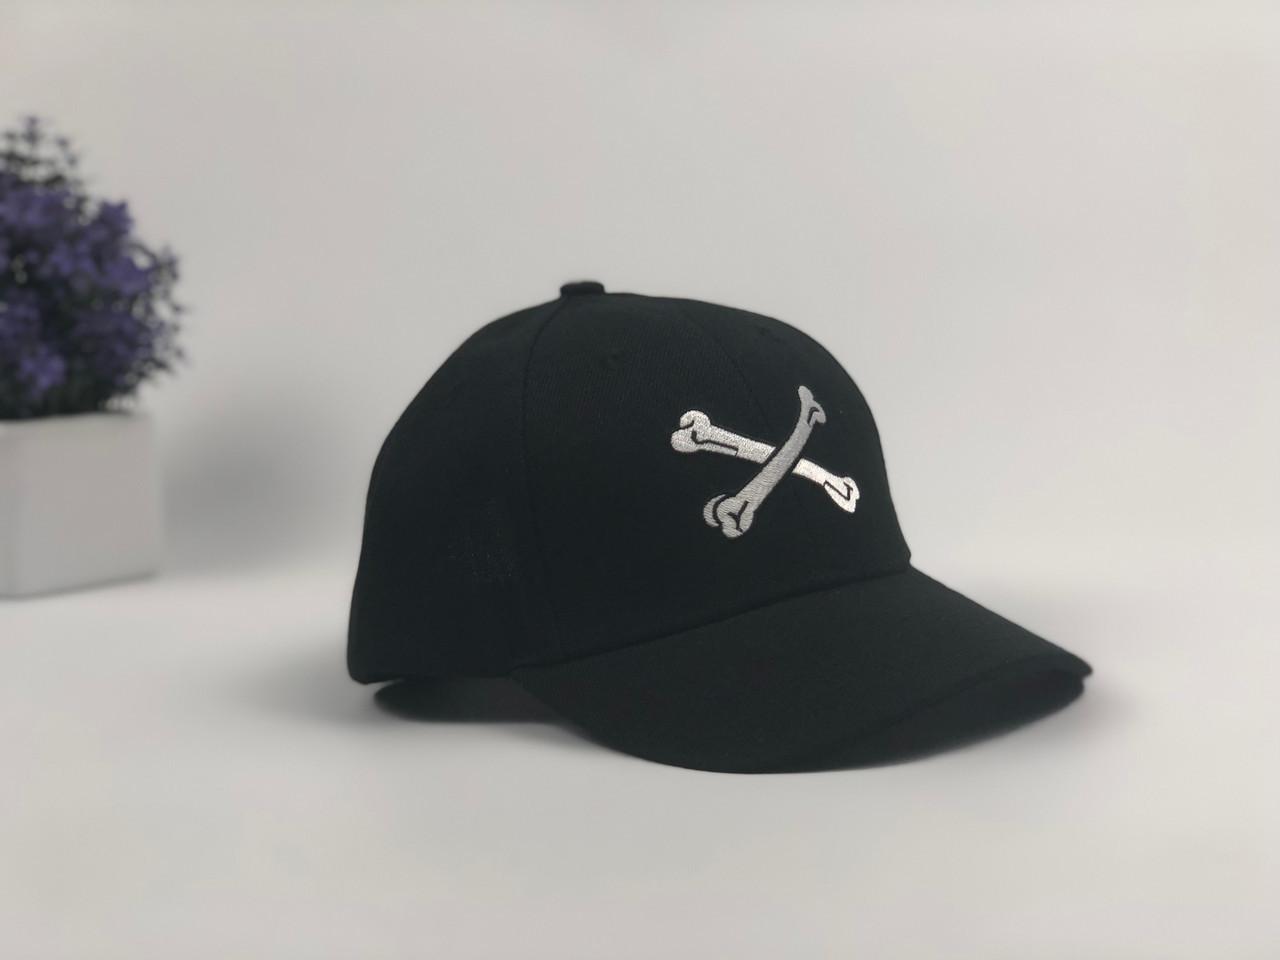 Кепка бейсболка Wuke Кости (черная)